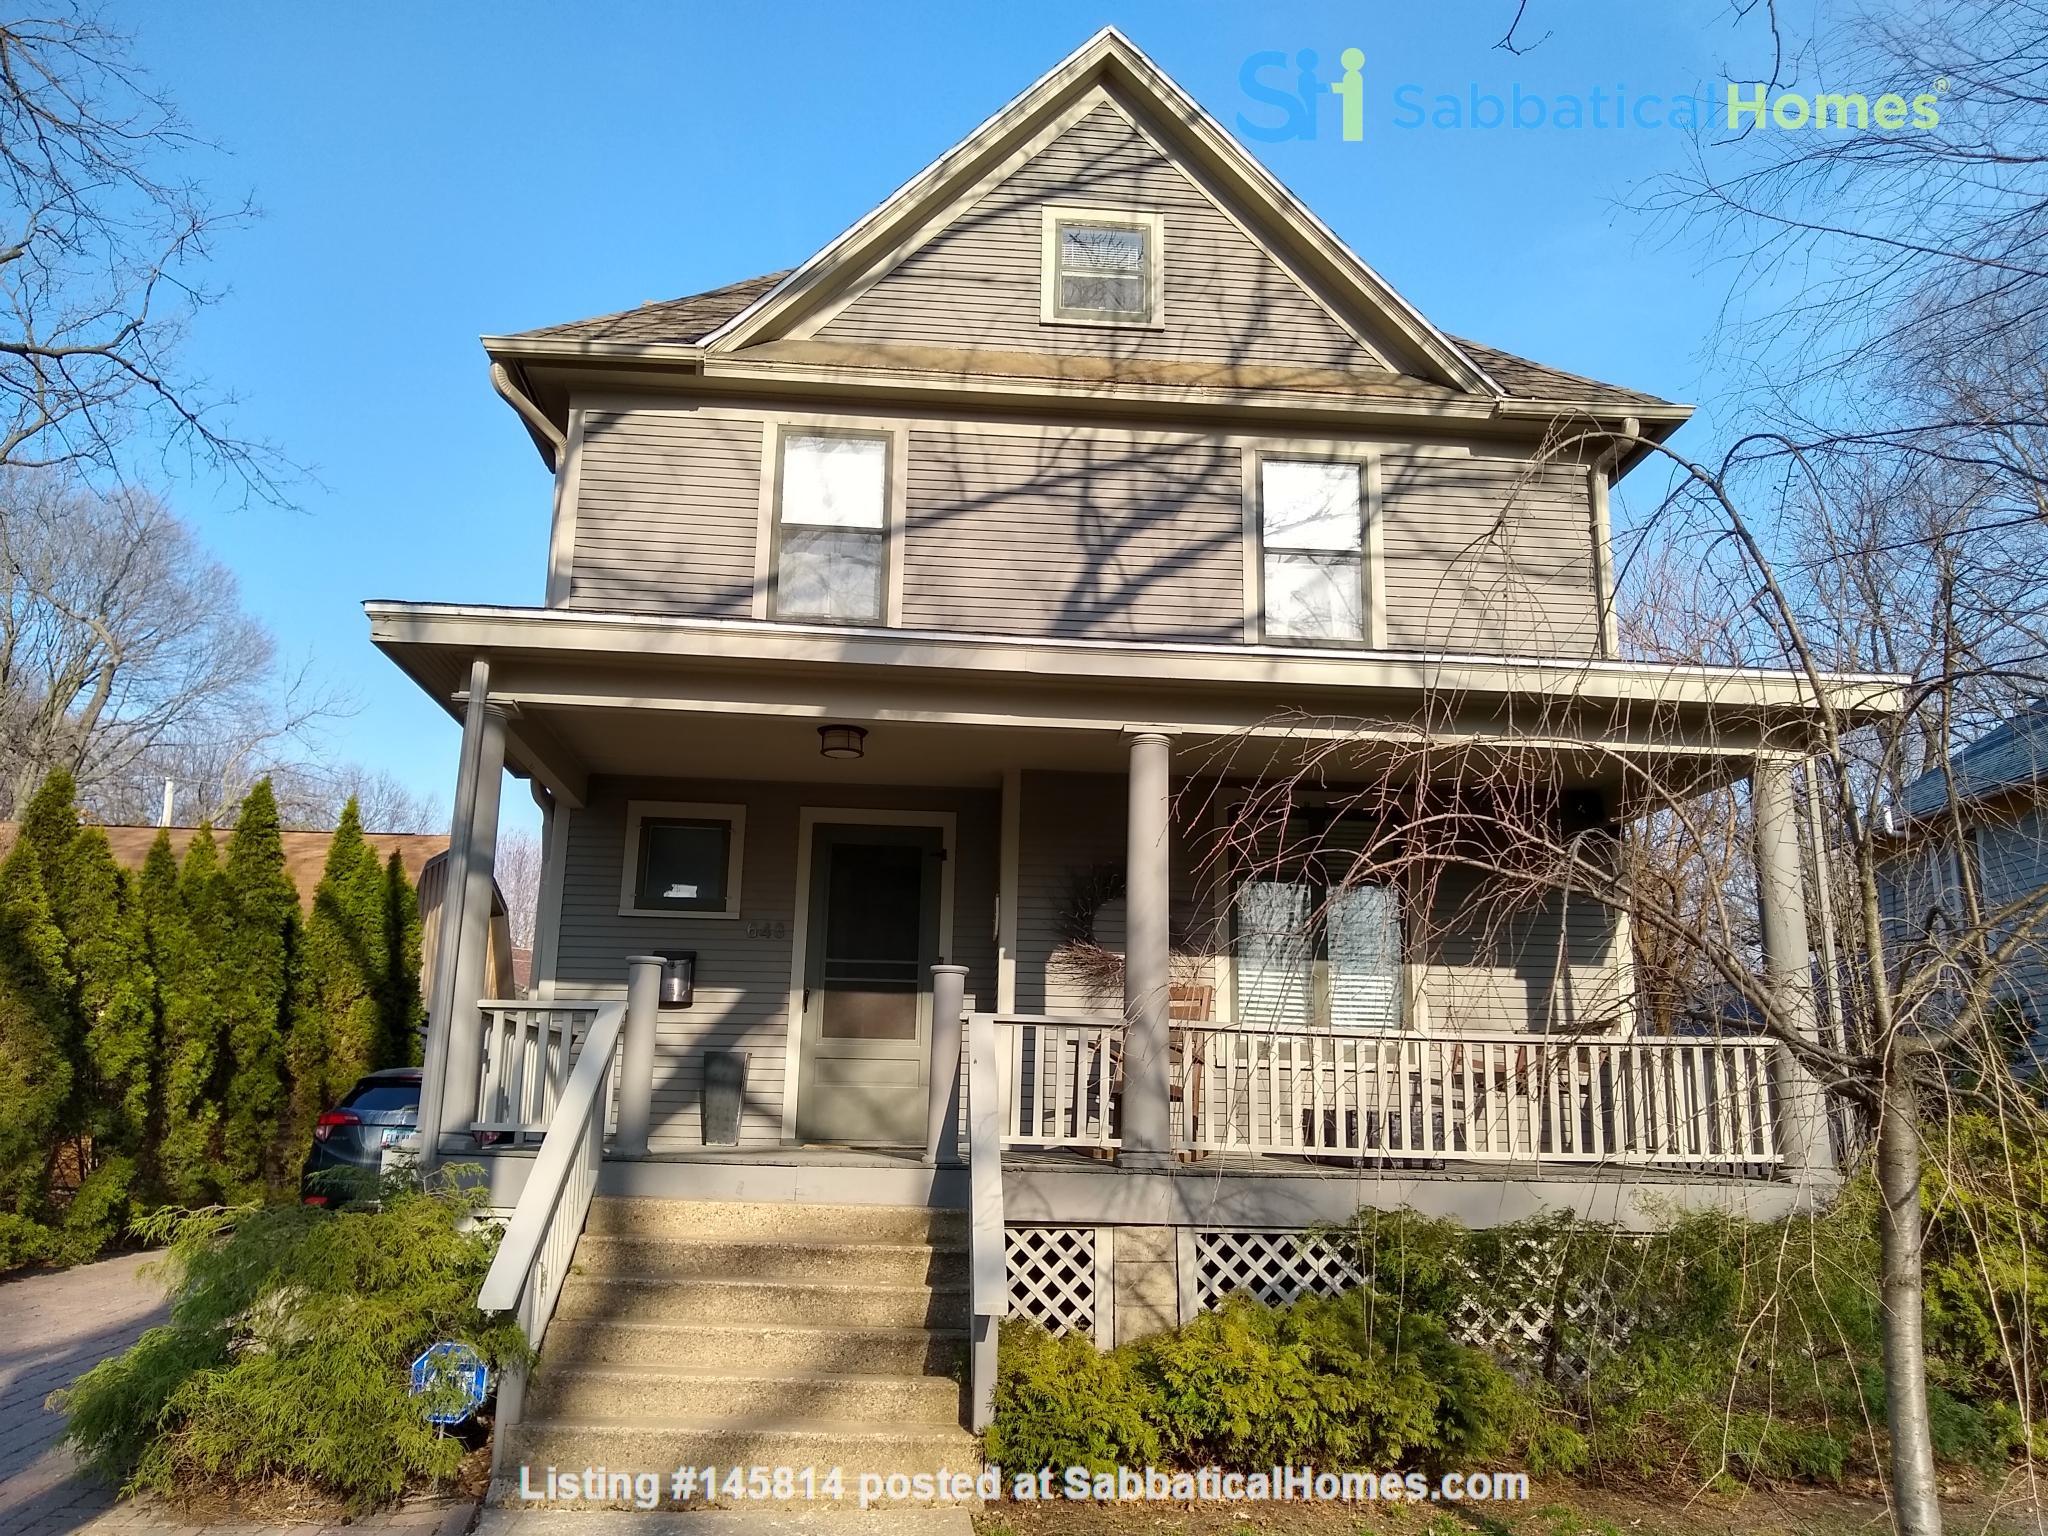 Classic & Stylish Prairie Square Home Rental in Iowa City 0